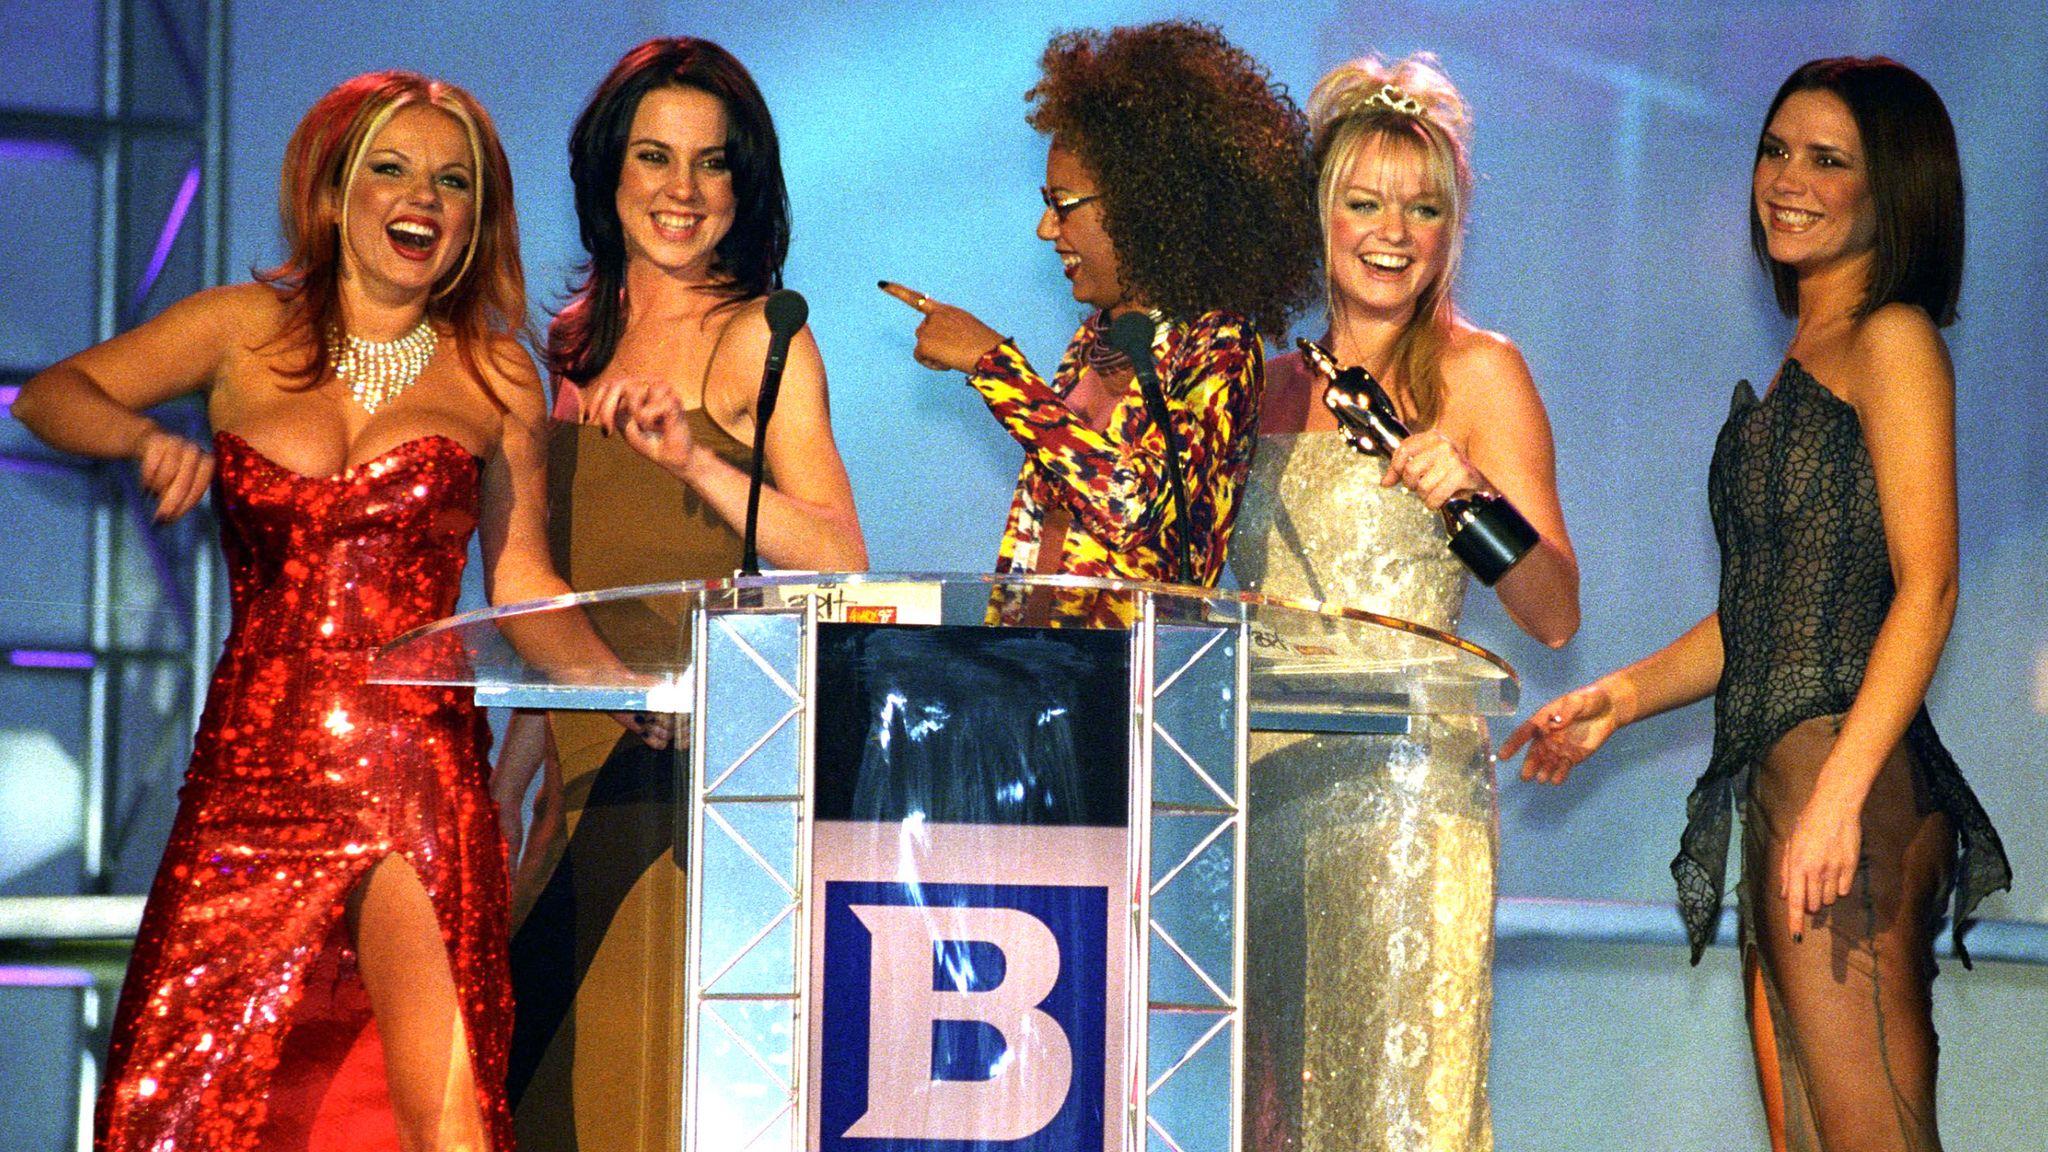 The Spice Girls in 1997. Pic: Alan Davidson/Shutterstock